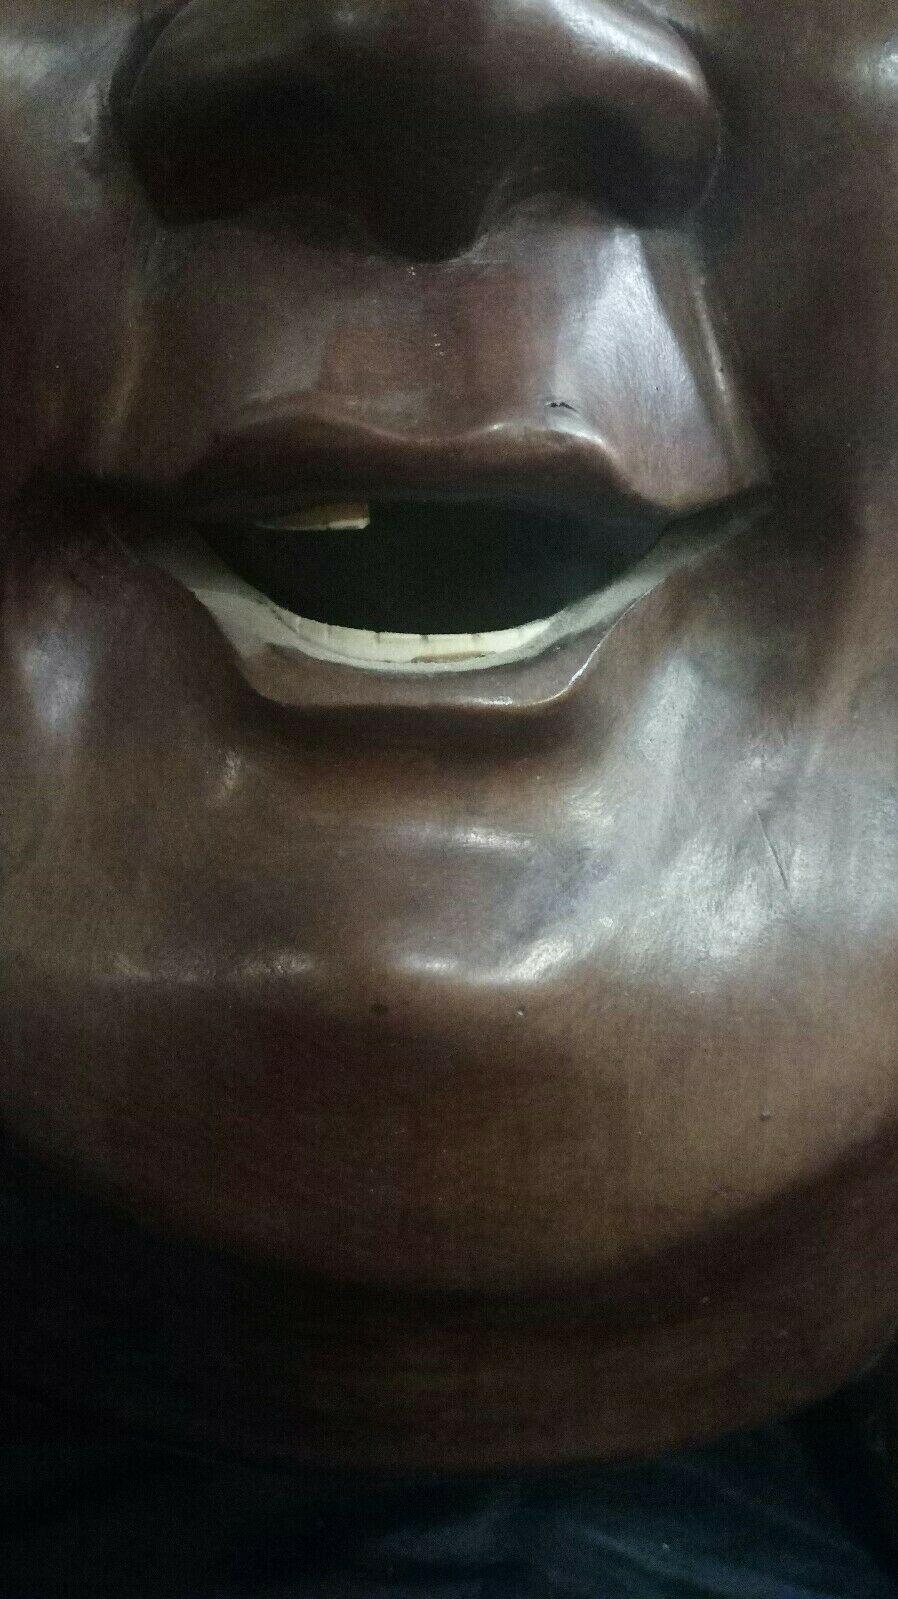 thumb2|Maschera cinese